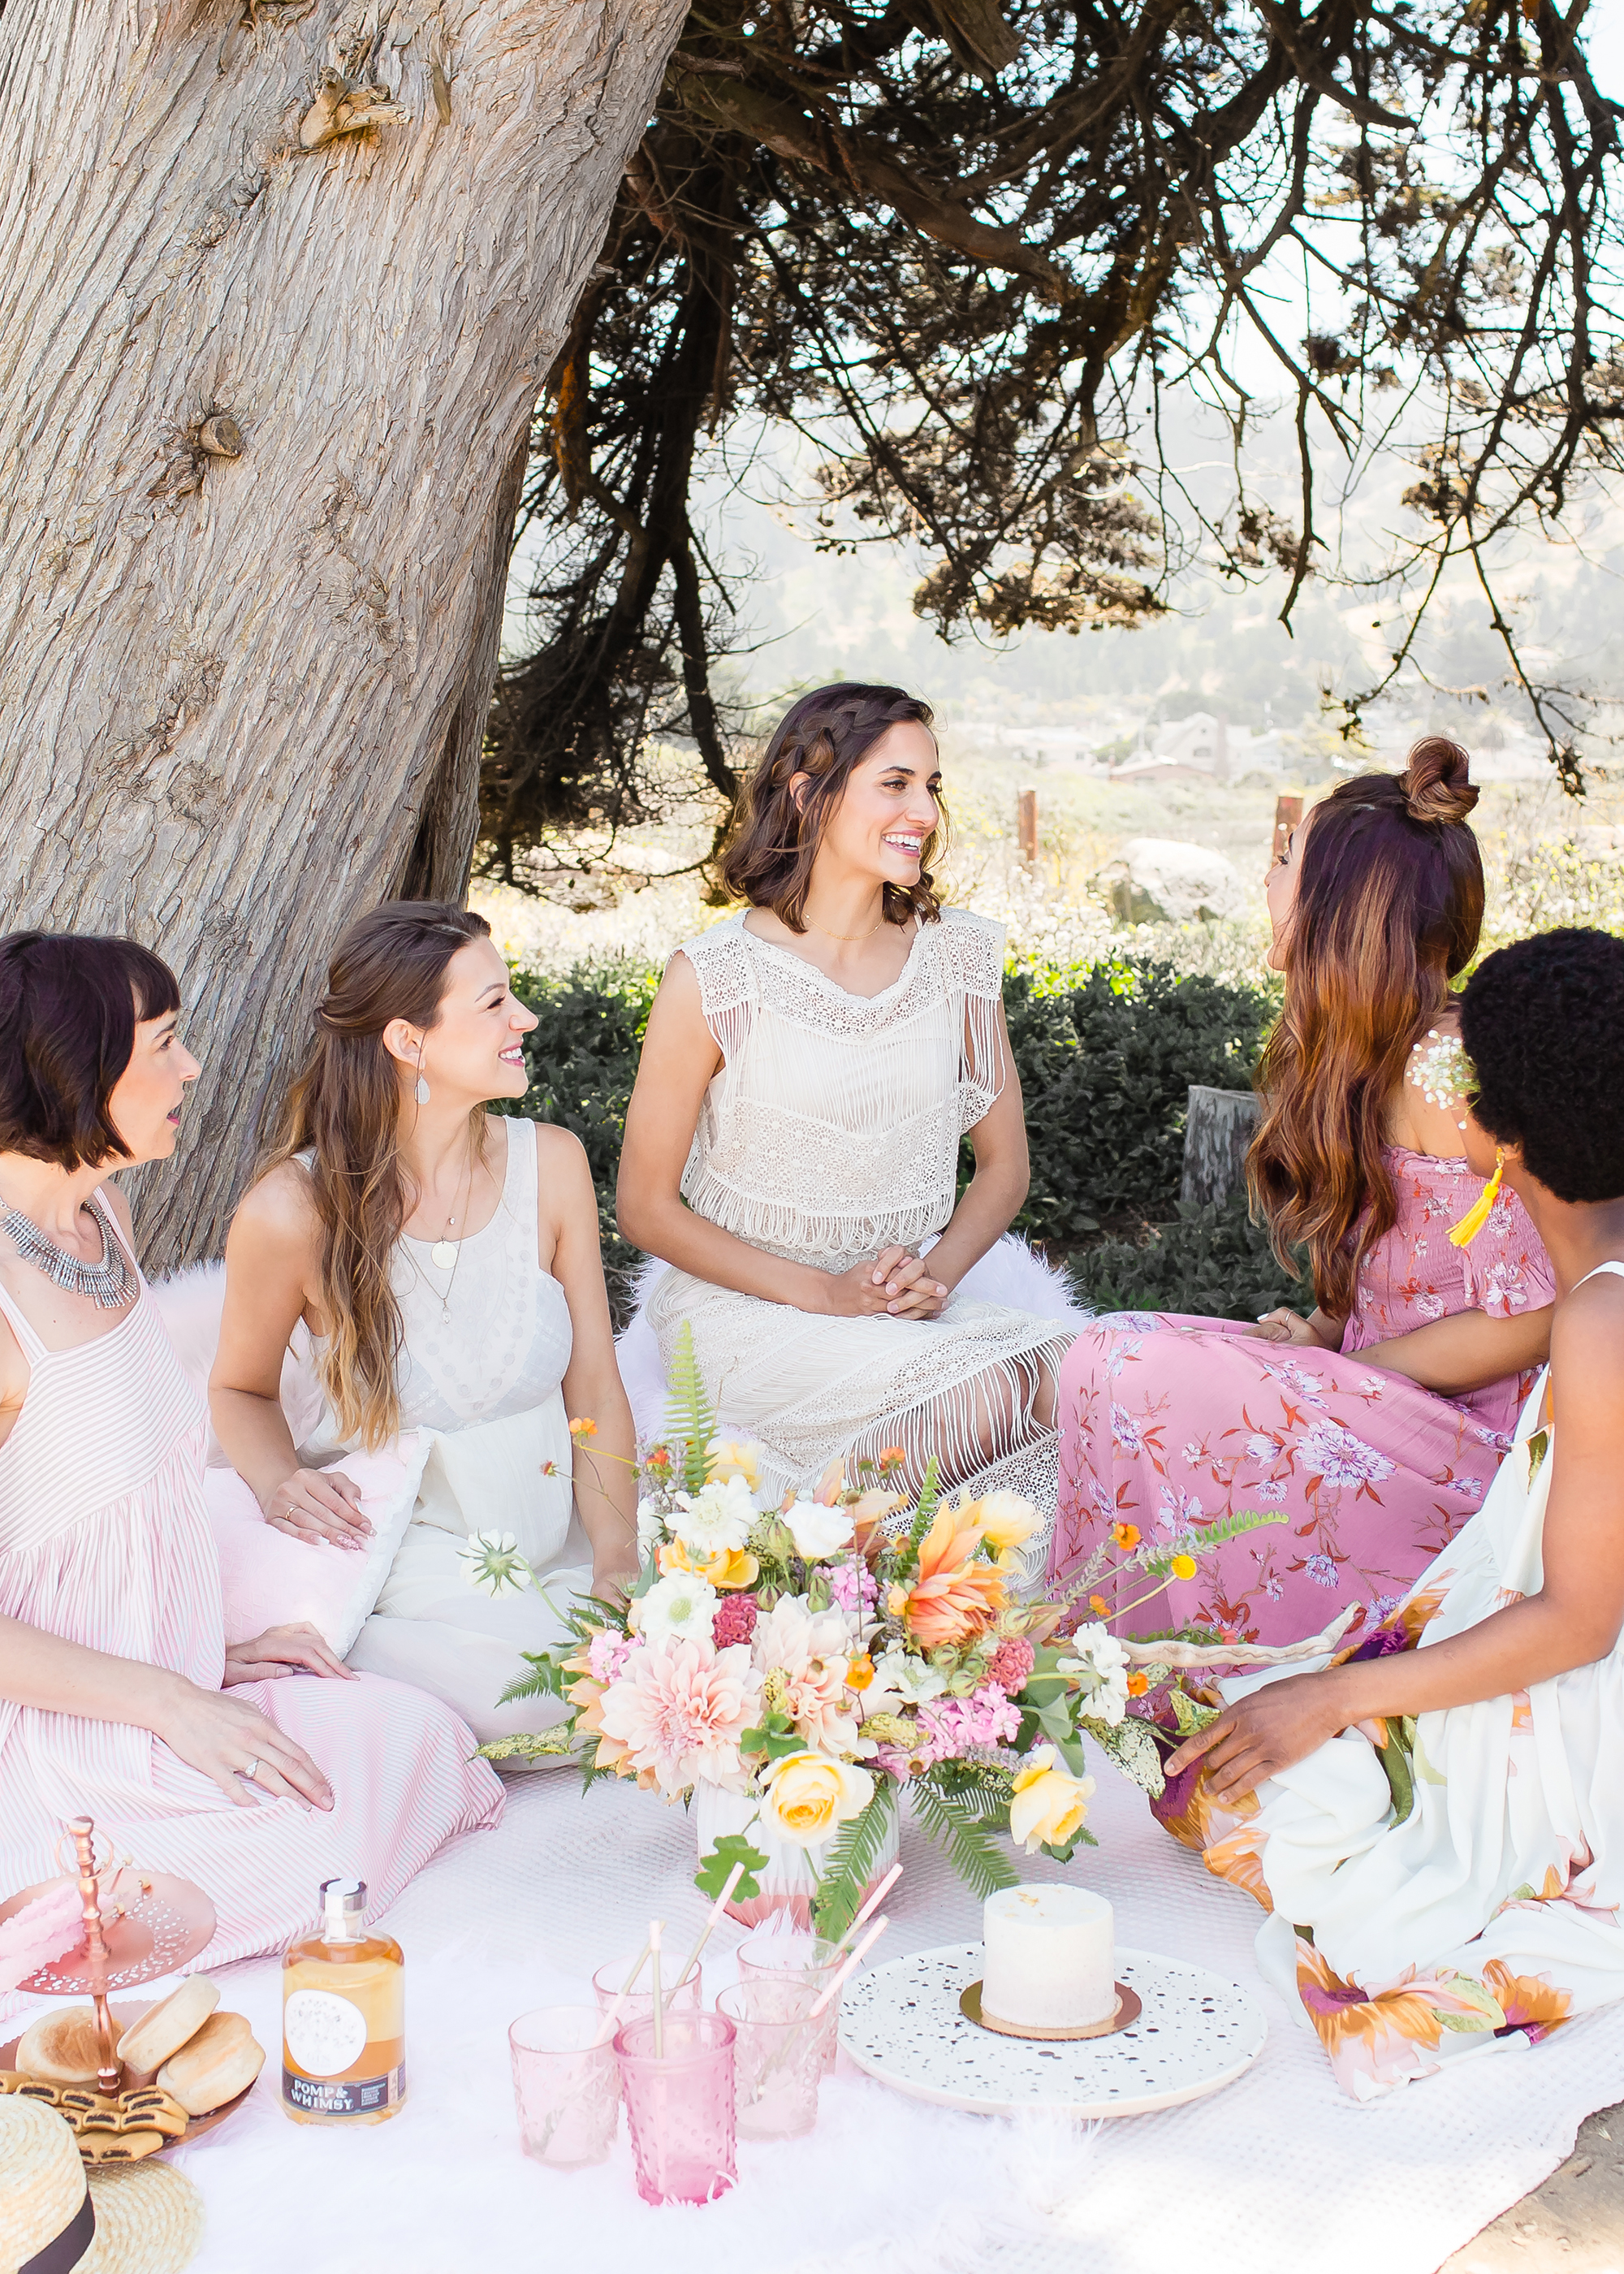 Pesta Bridal Sederhana di Ruangan Outdoor